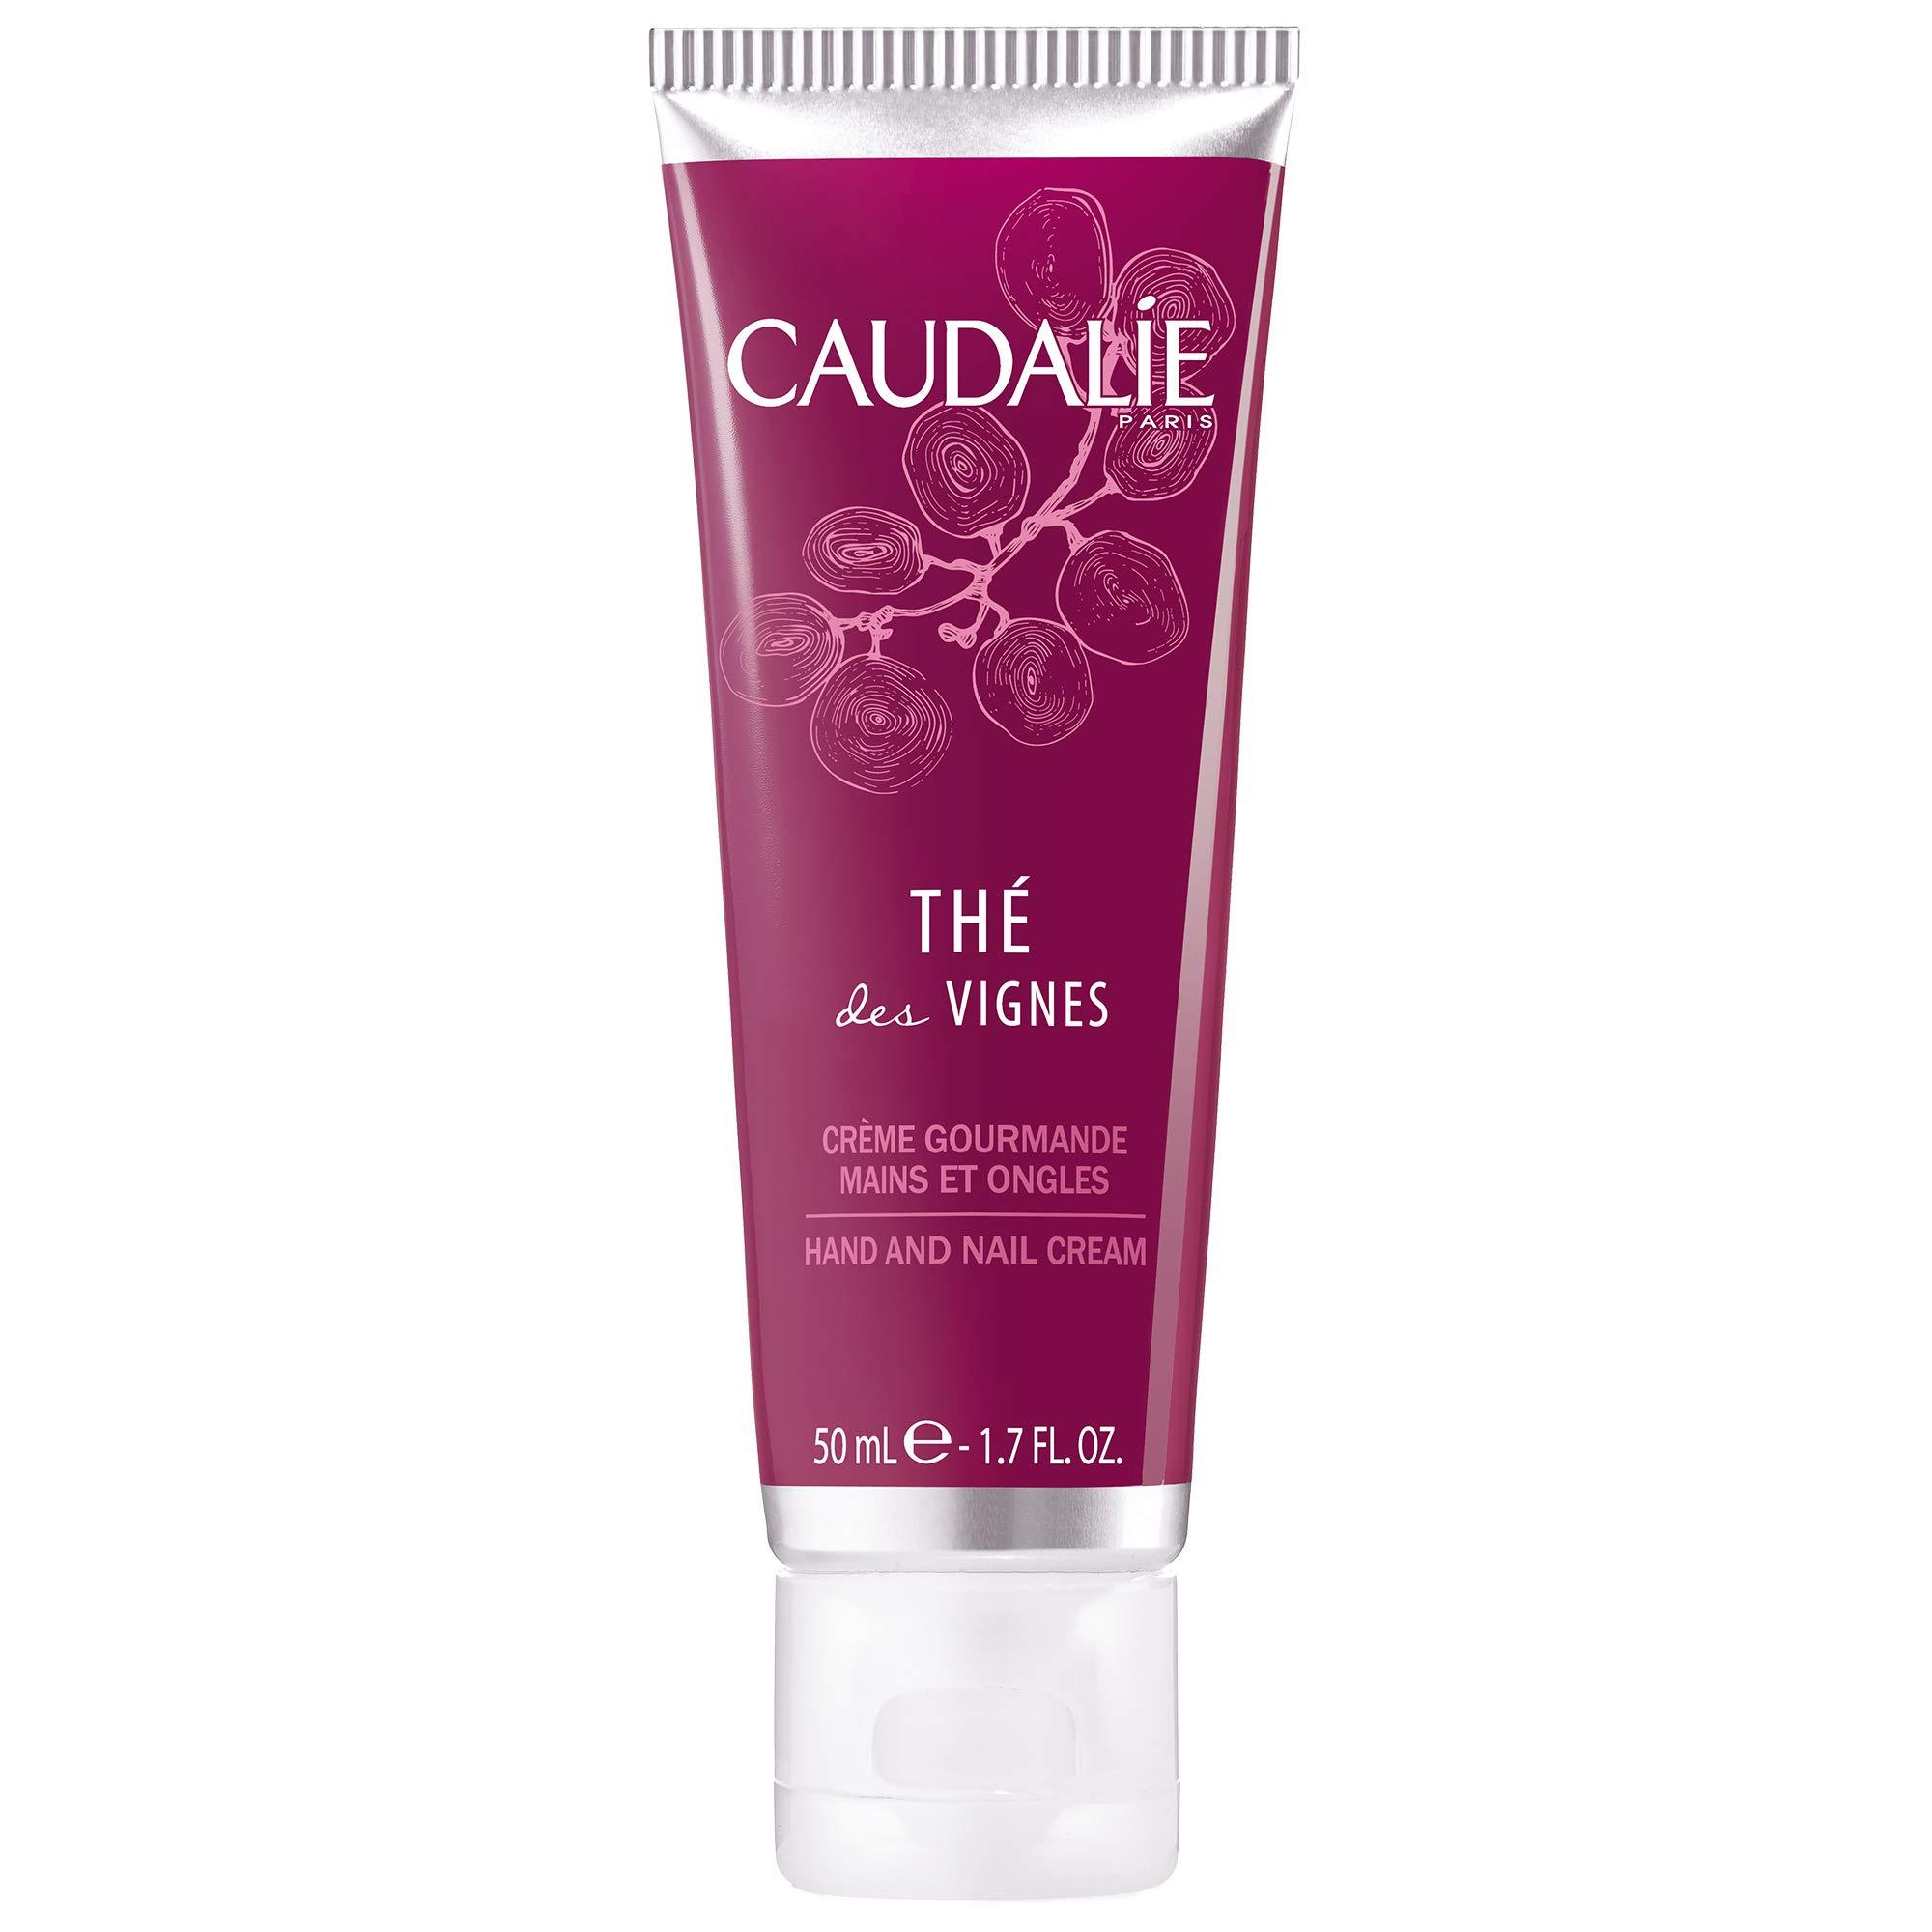 Caudalie Thé des Vignes Hand and Nail Cream 50ml